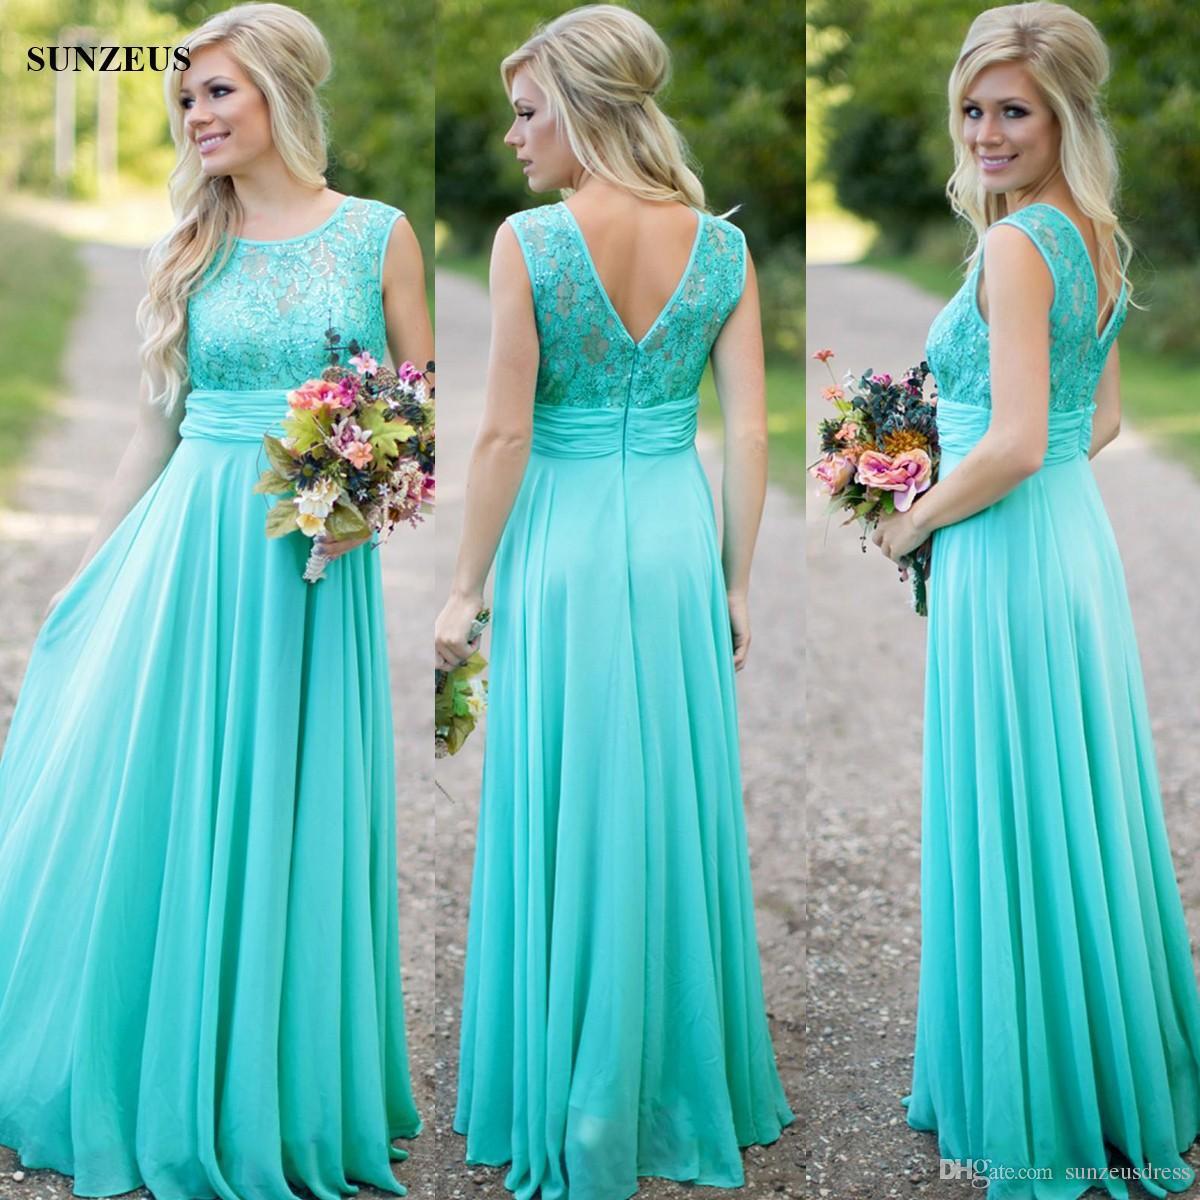 Designer Coolste Kleider In Türkis Farbe Ärmel10 Einfach Kleider In Türkis Farbe Ärmel